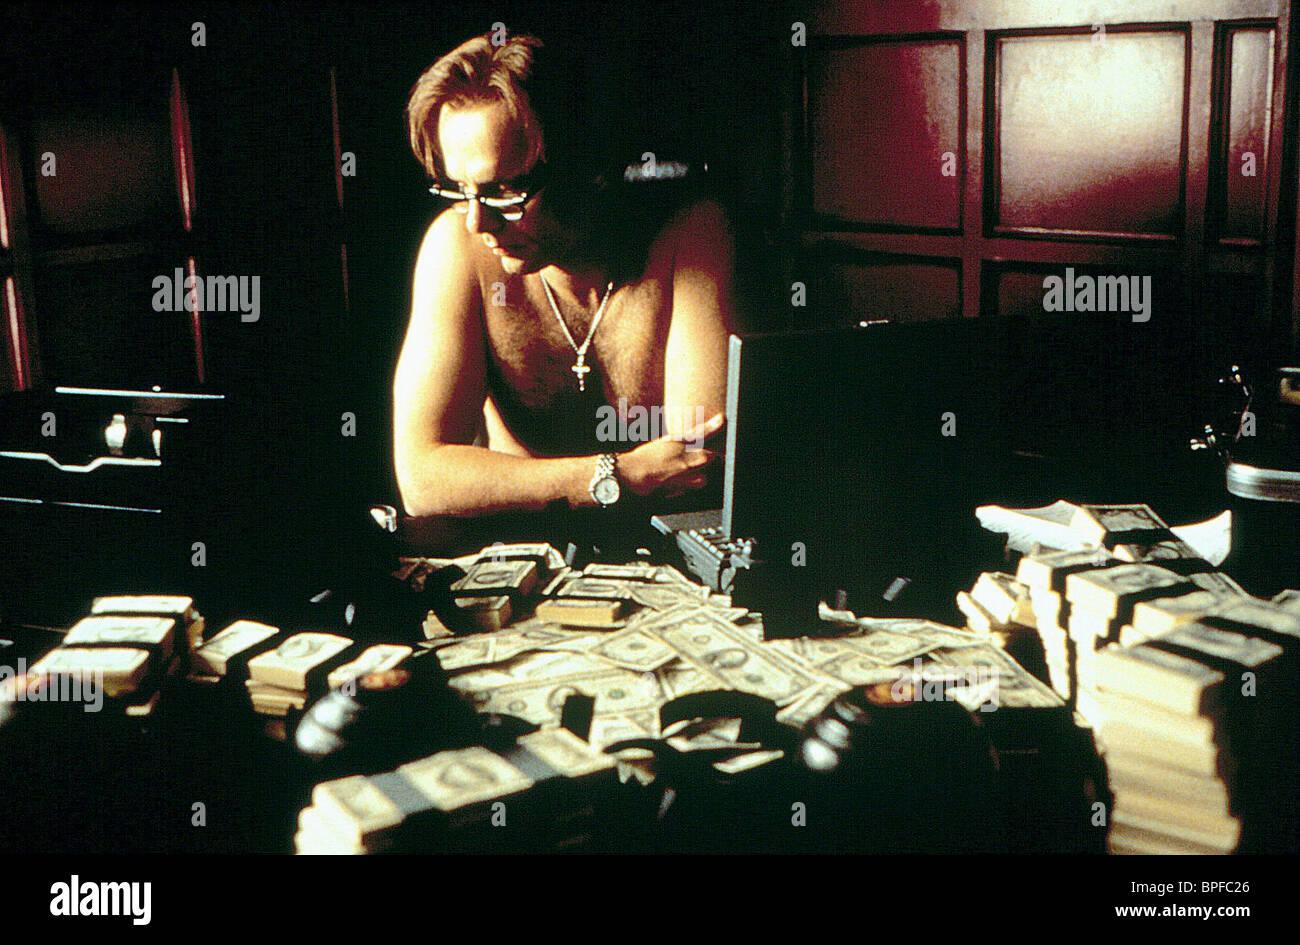 JOE PANTOLIANO BOUND (1996) - Stock Image